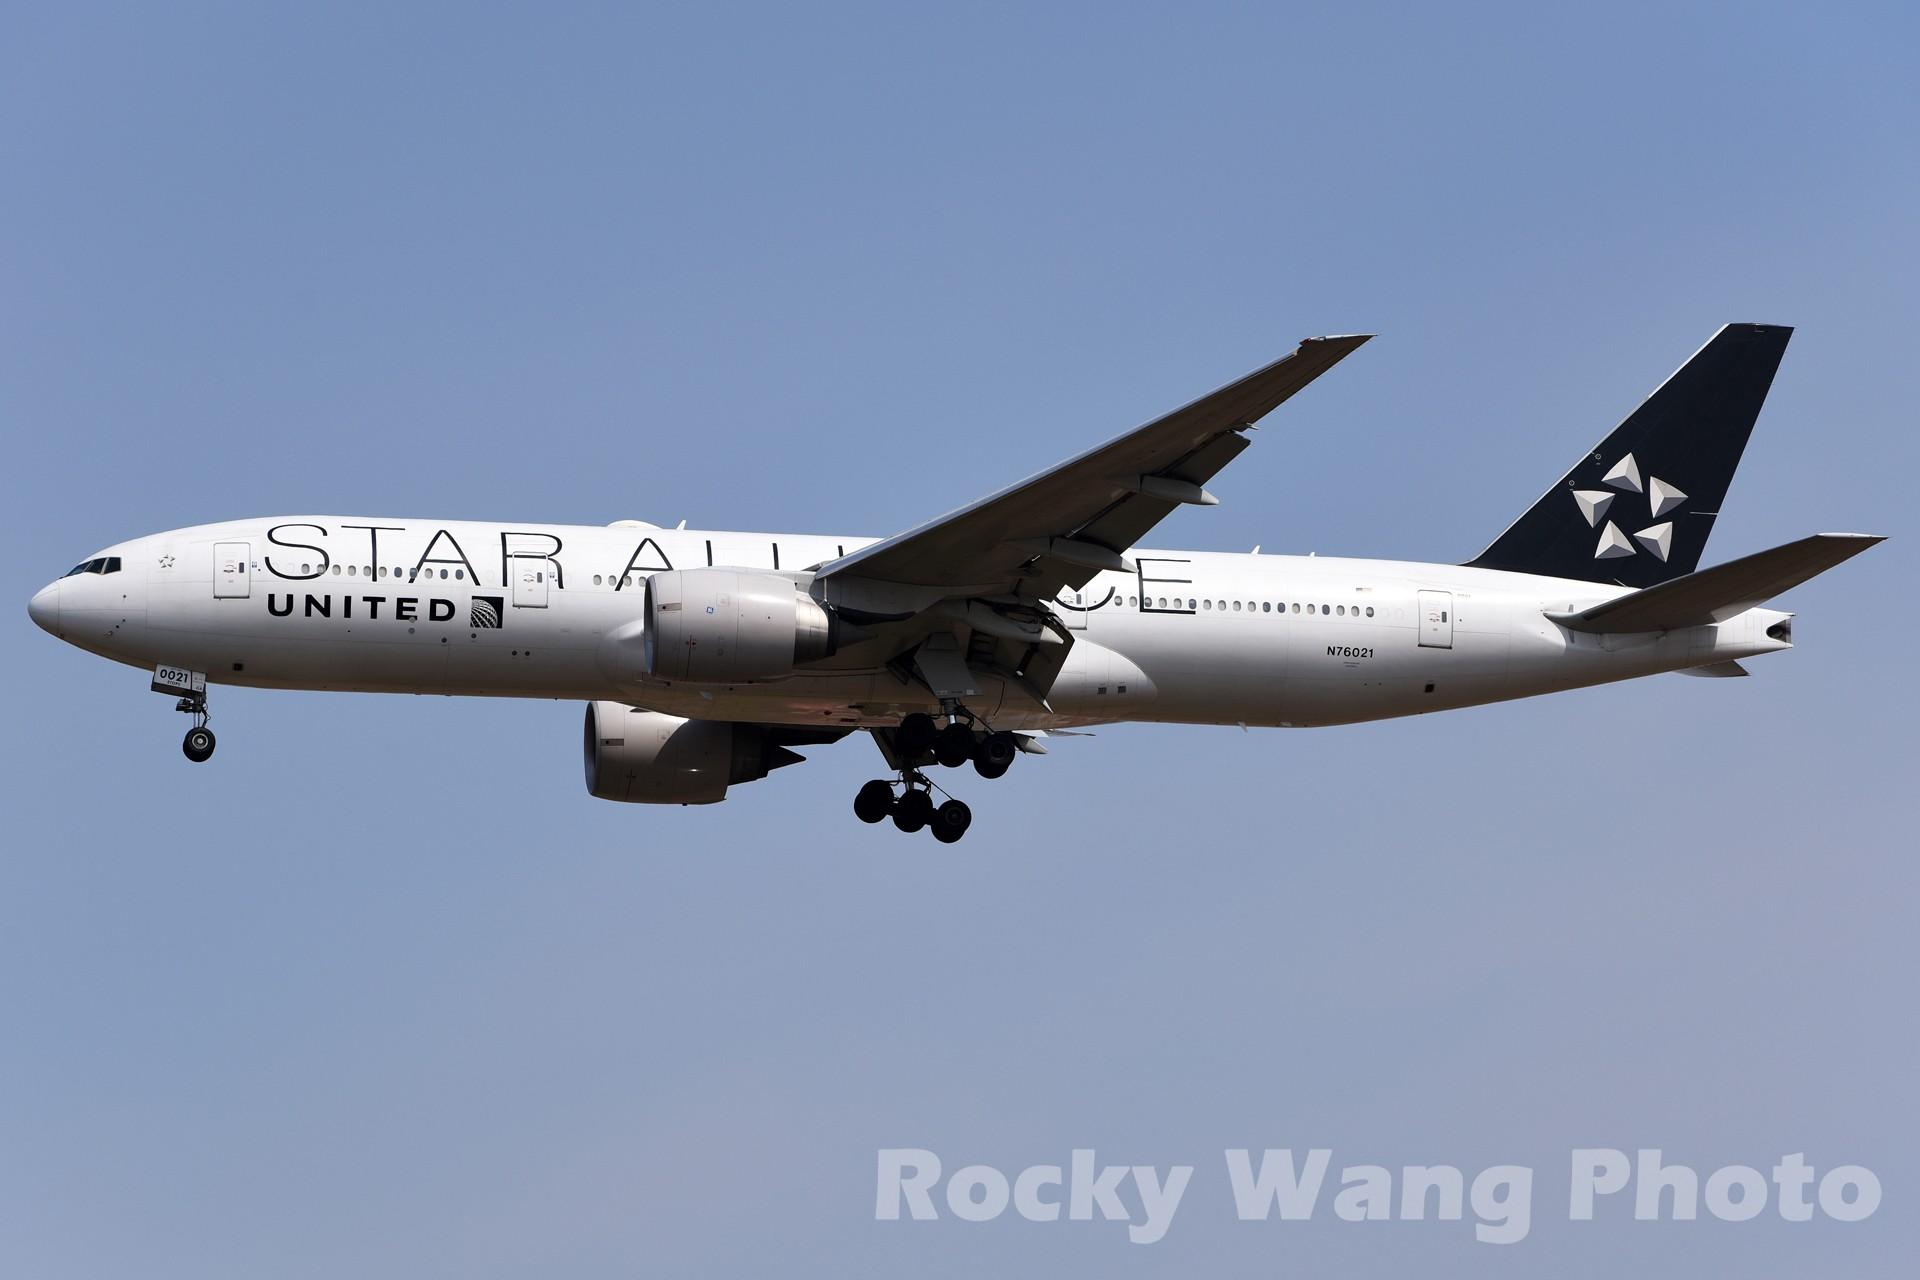 Re:[原创]白与黑 BOEING 777-200ER N76021 中国上海浦东国际机场